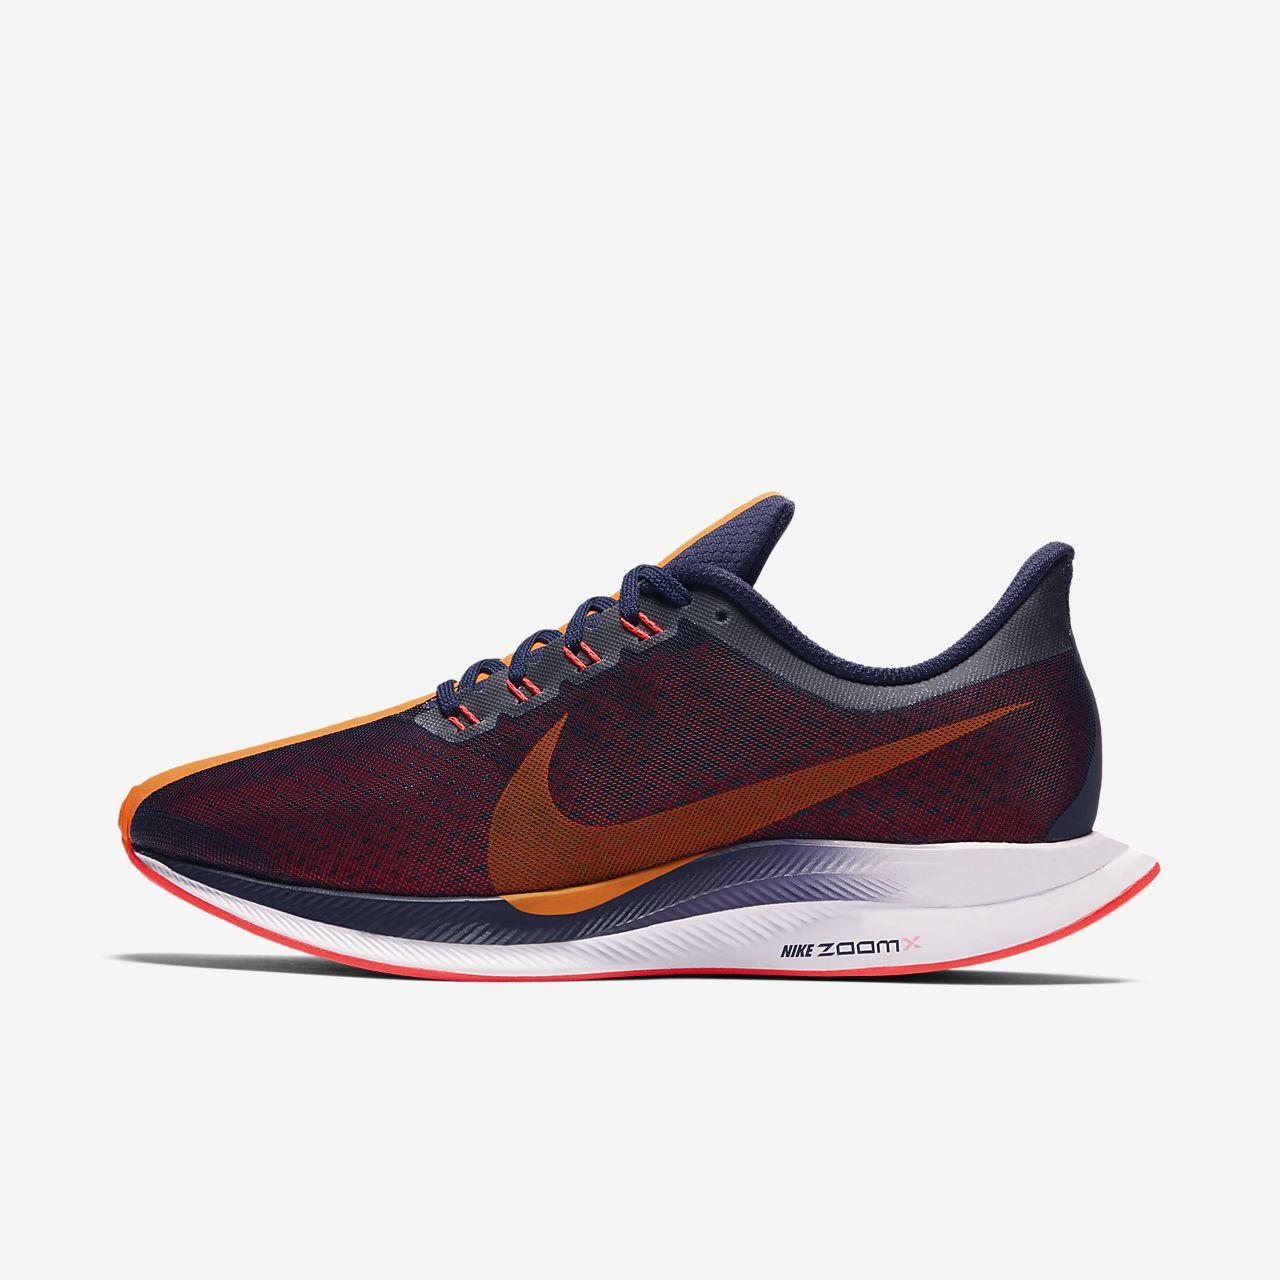 competitive price a3e88 bd5be Nike Zoom Pegasus Turbo Damen-Laufschuh